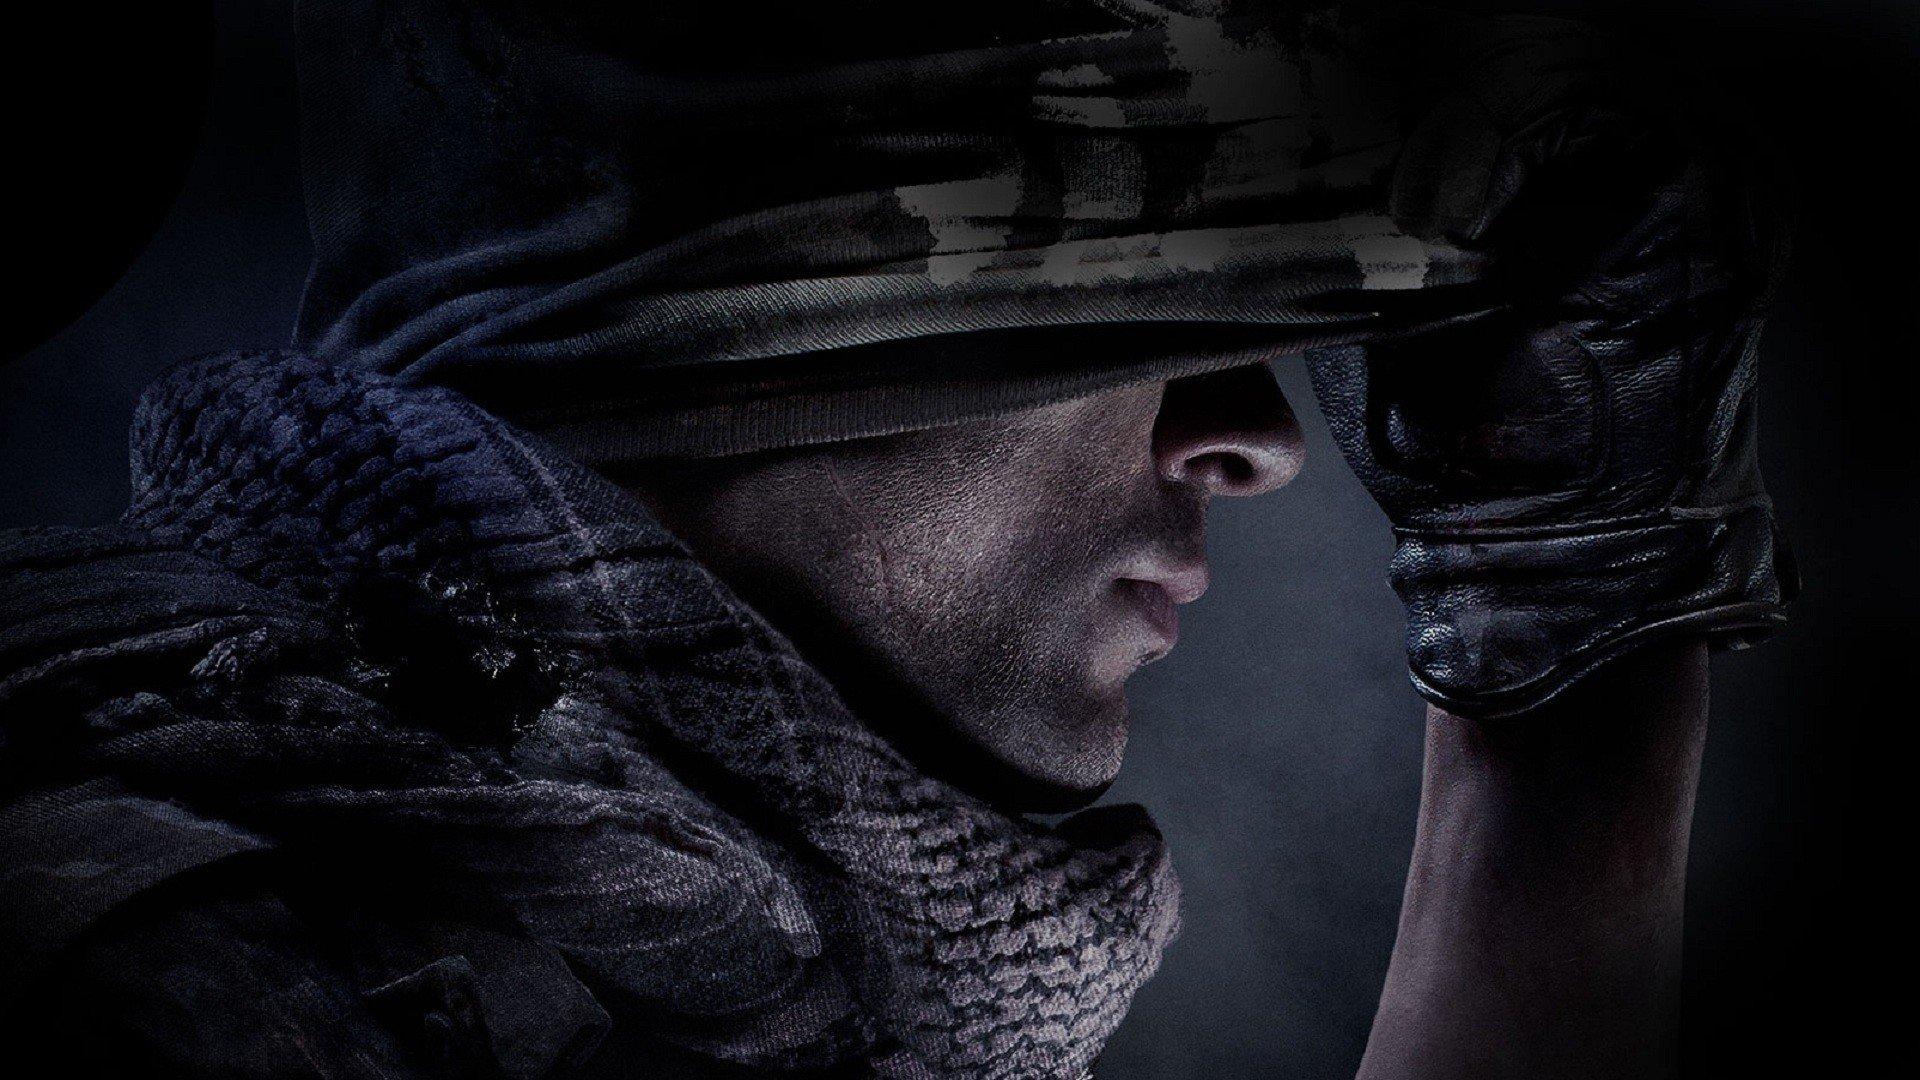 Call of Duty Ghosts Promo Wallpaper   Nexus Wallpaper 1920x1080